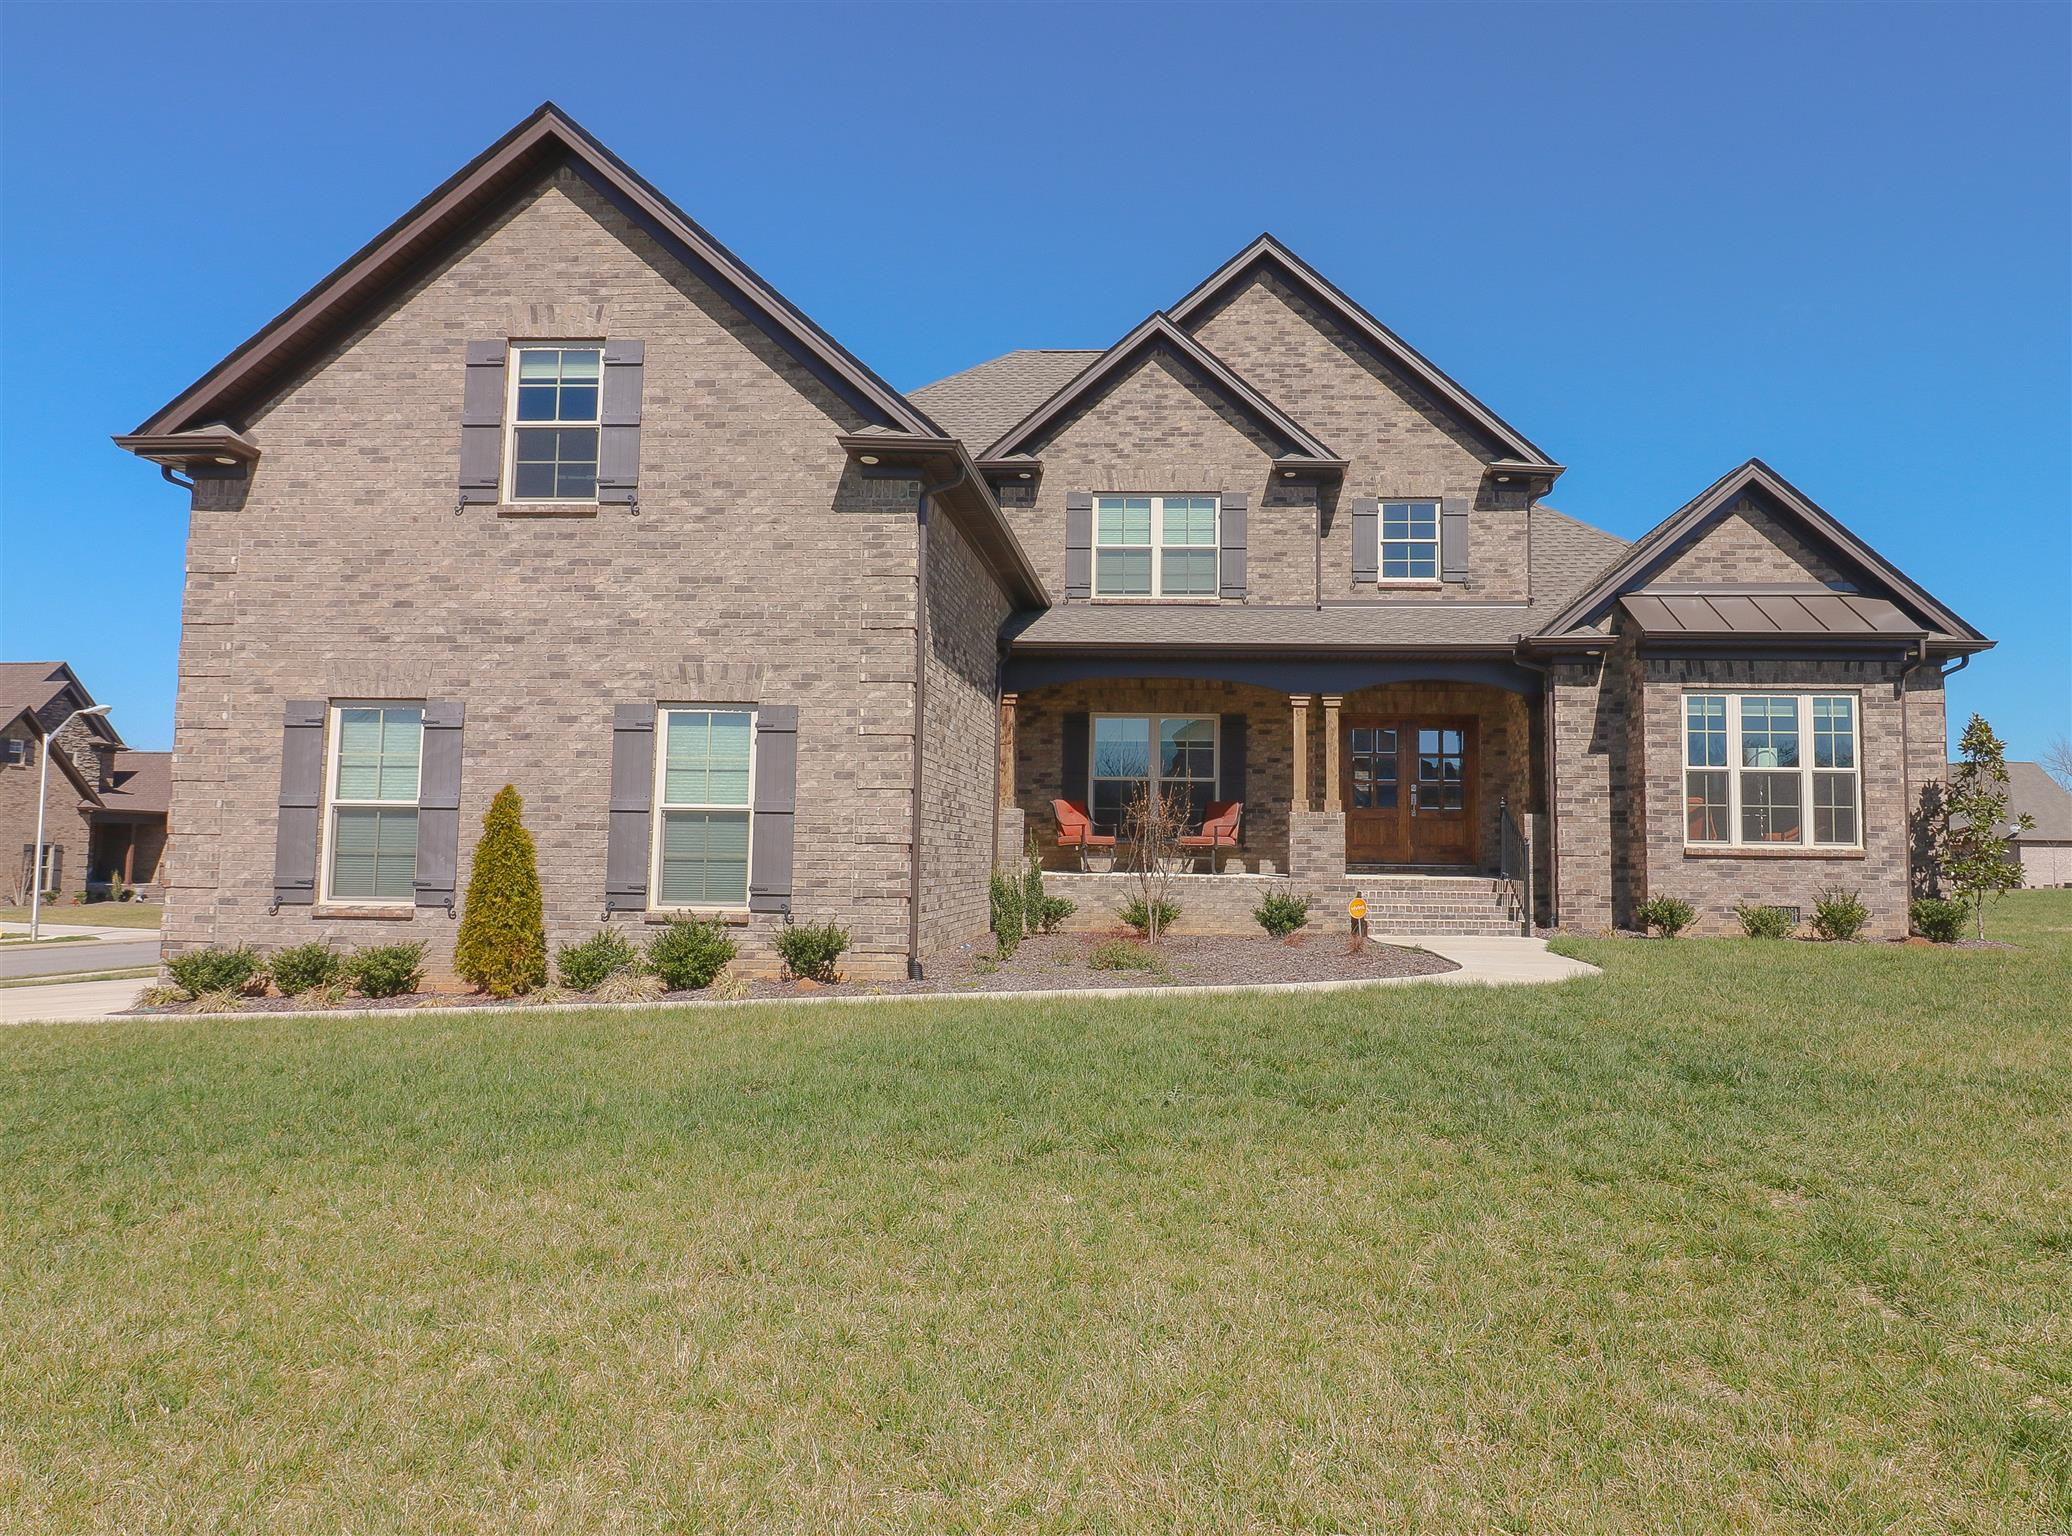 3024 Robinwood Dr, Murfreesboro, TN 37128 - Murfreesboro, TN real estate listing